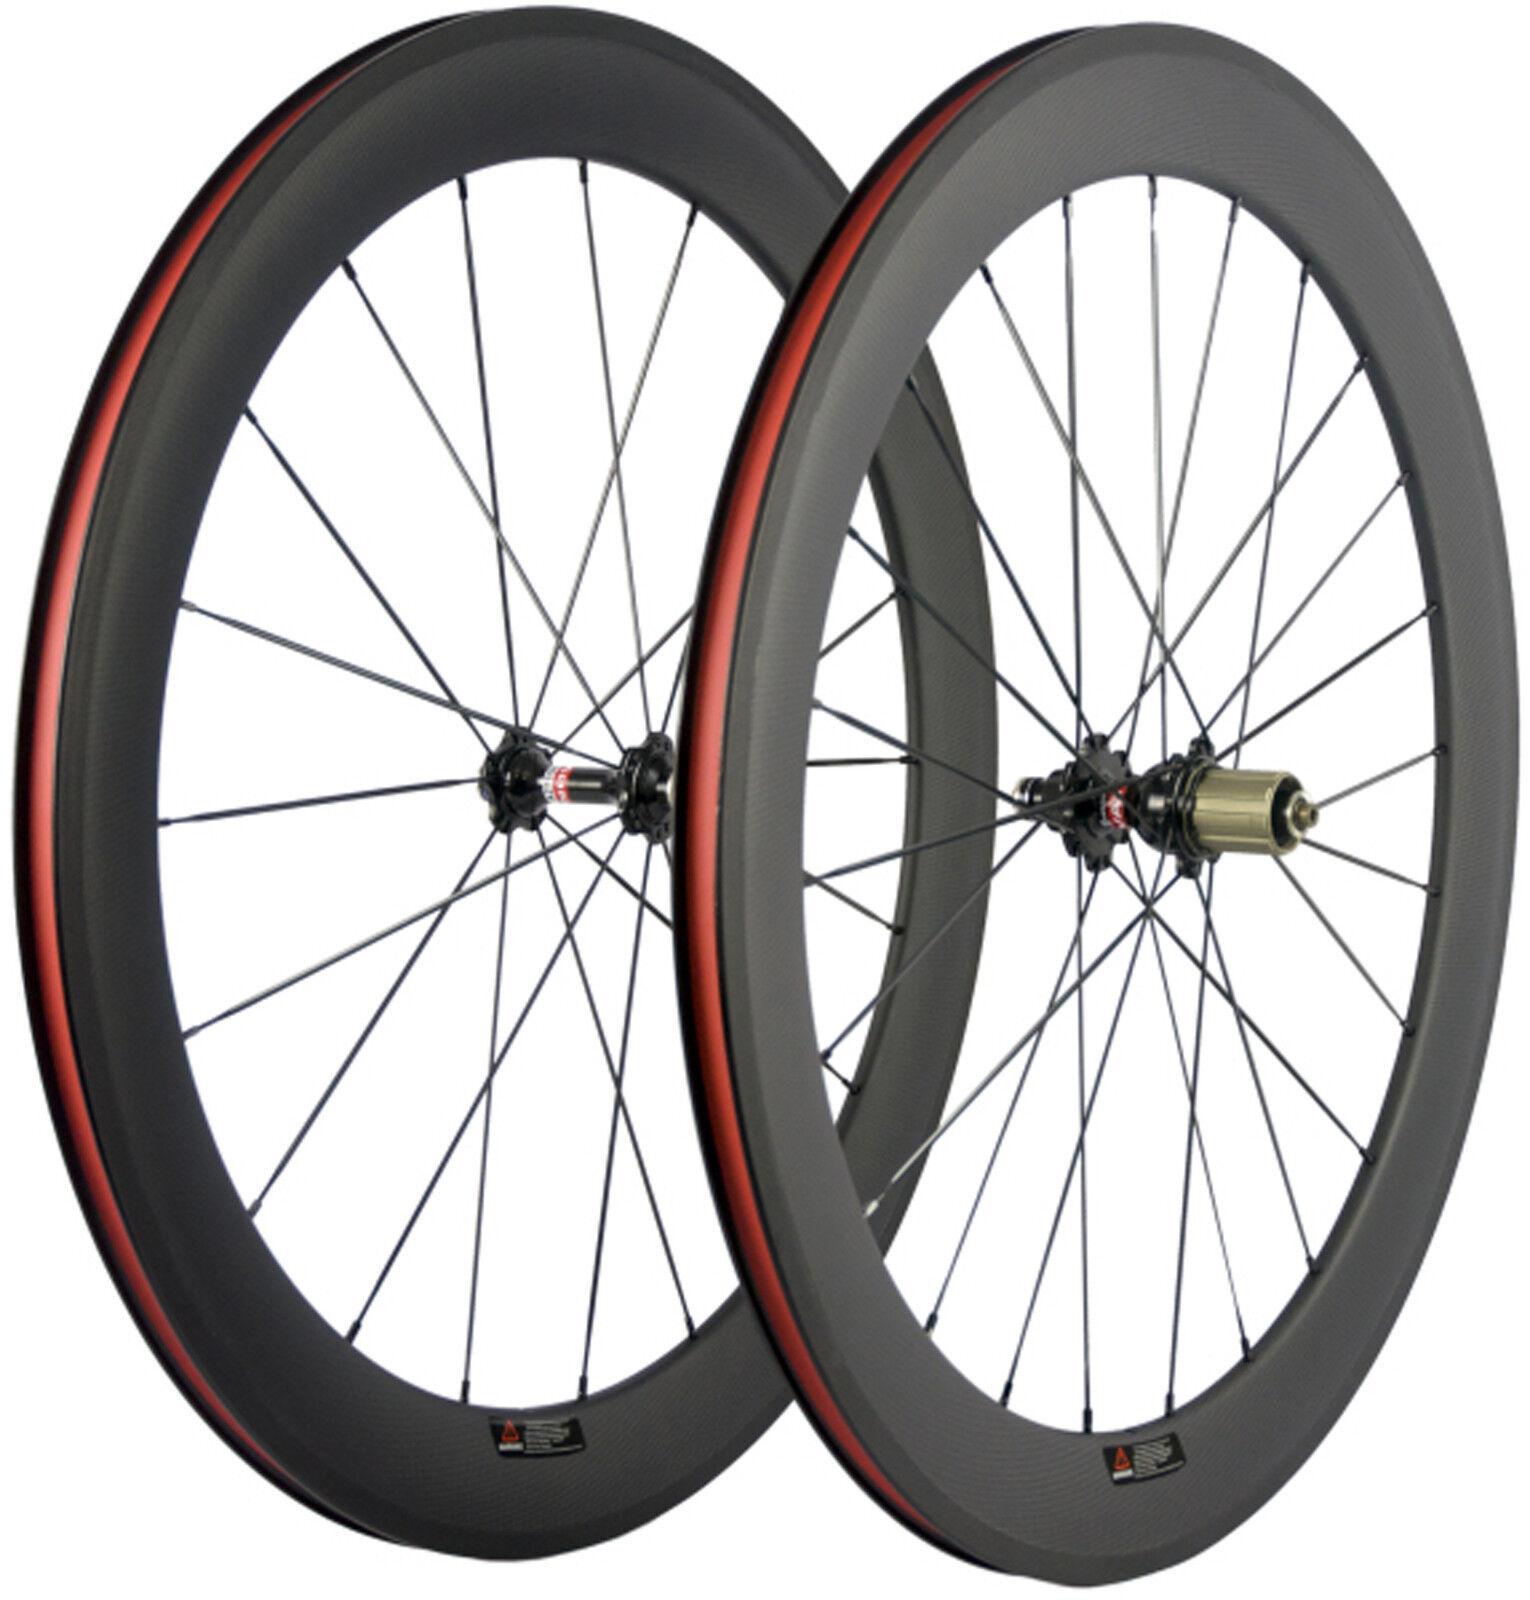 Full Carbon Fiber Wheels  Road Bike Wheelset 60mm Depth 23mm Width 700C Bicycle  convenient